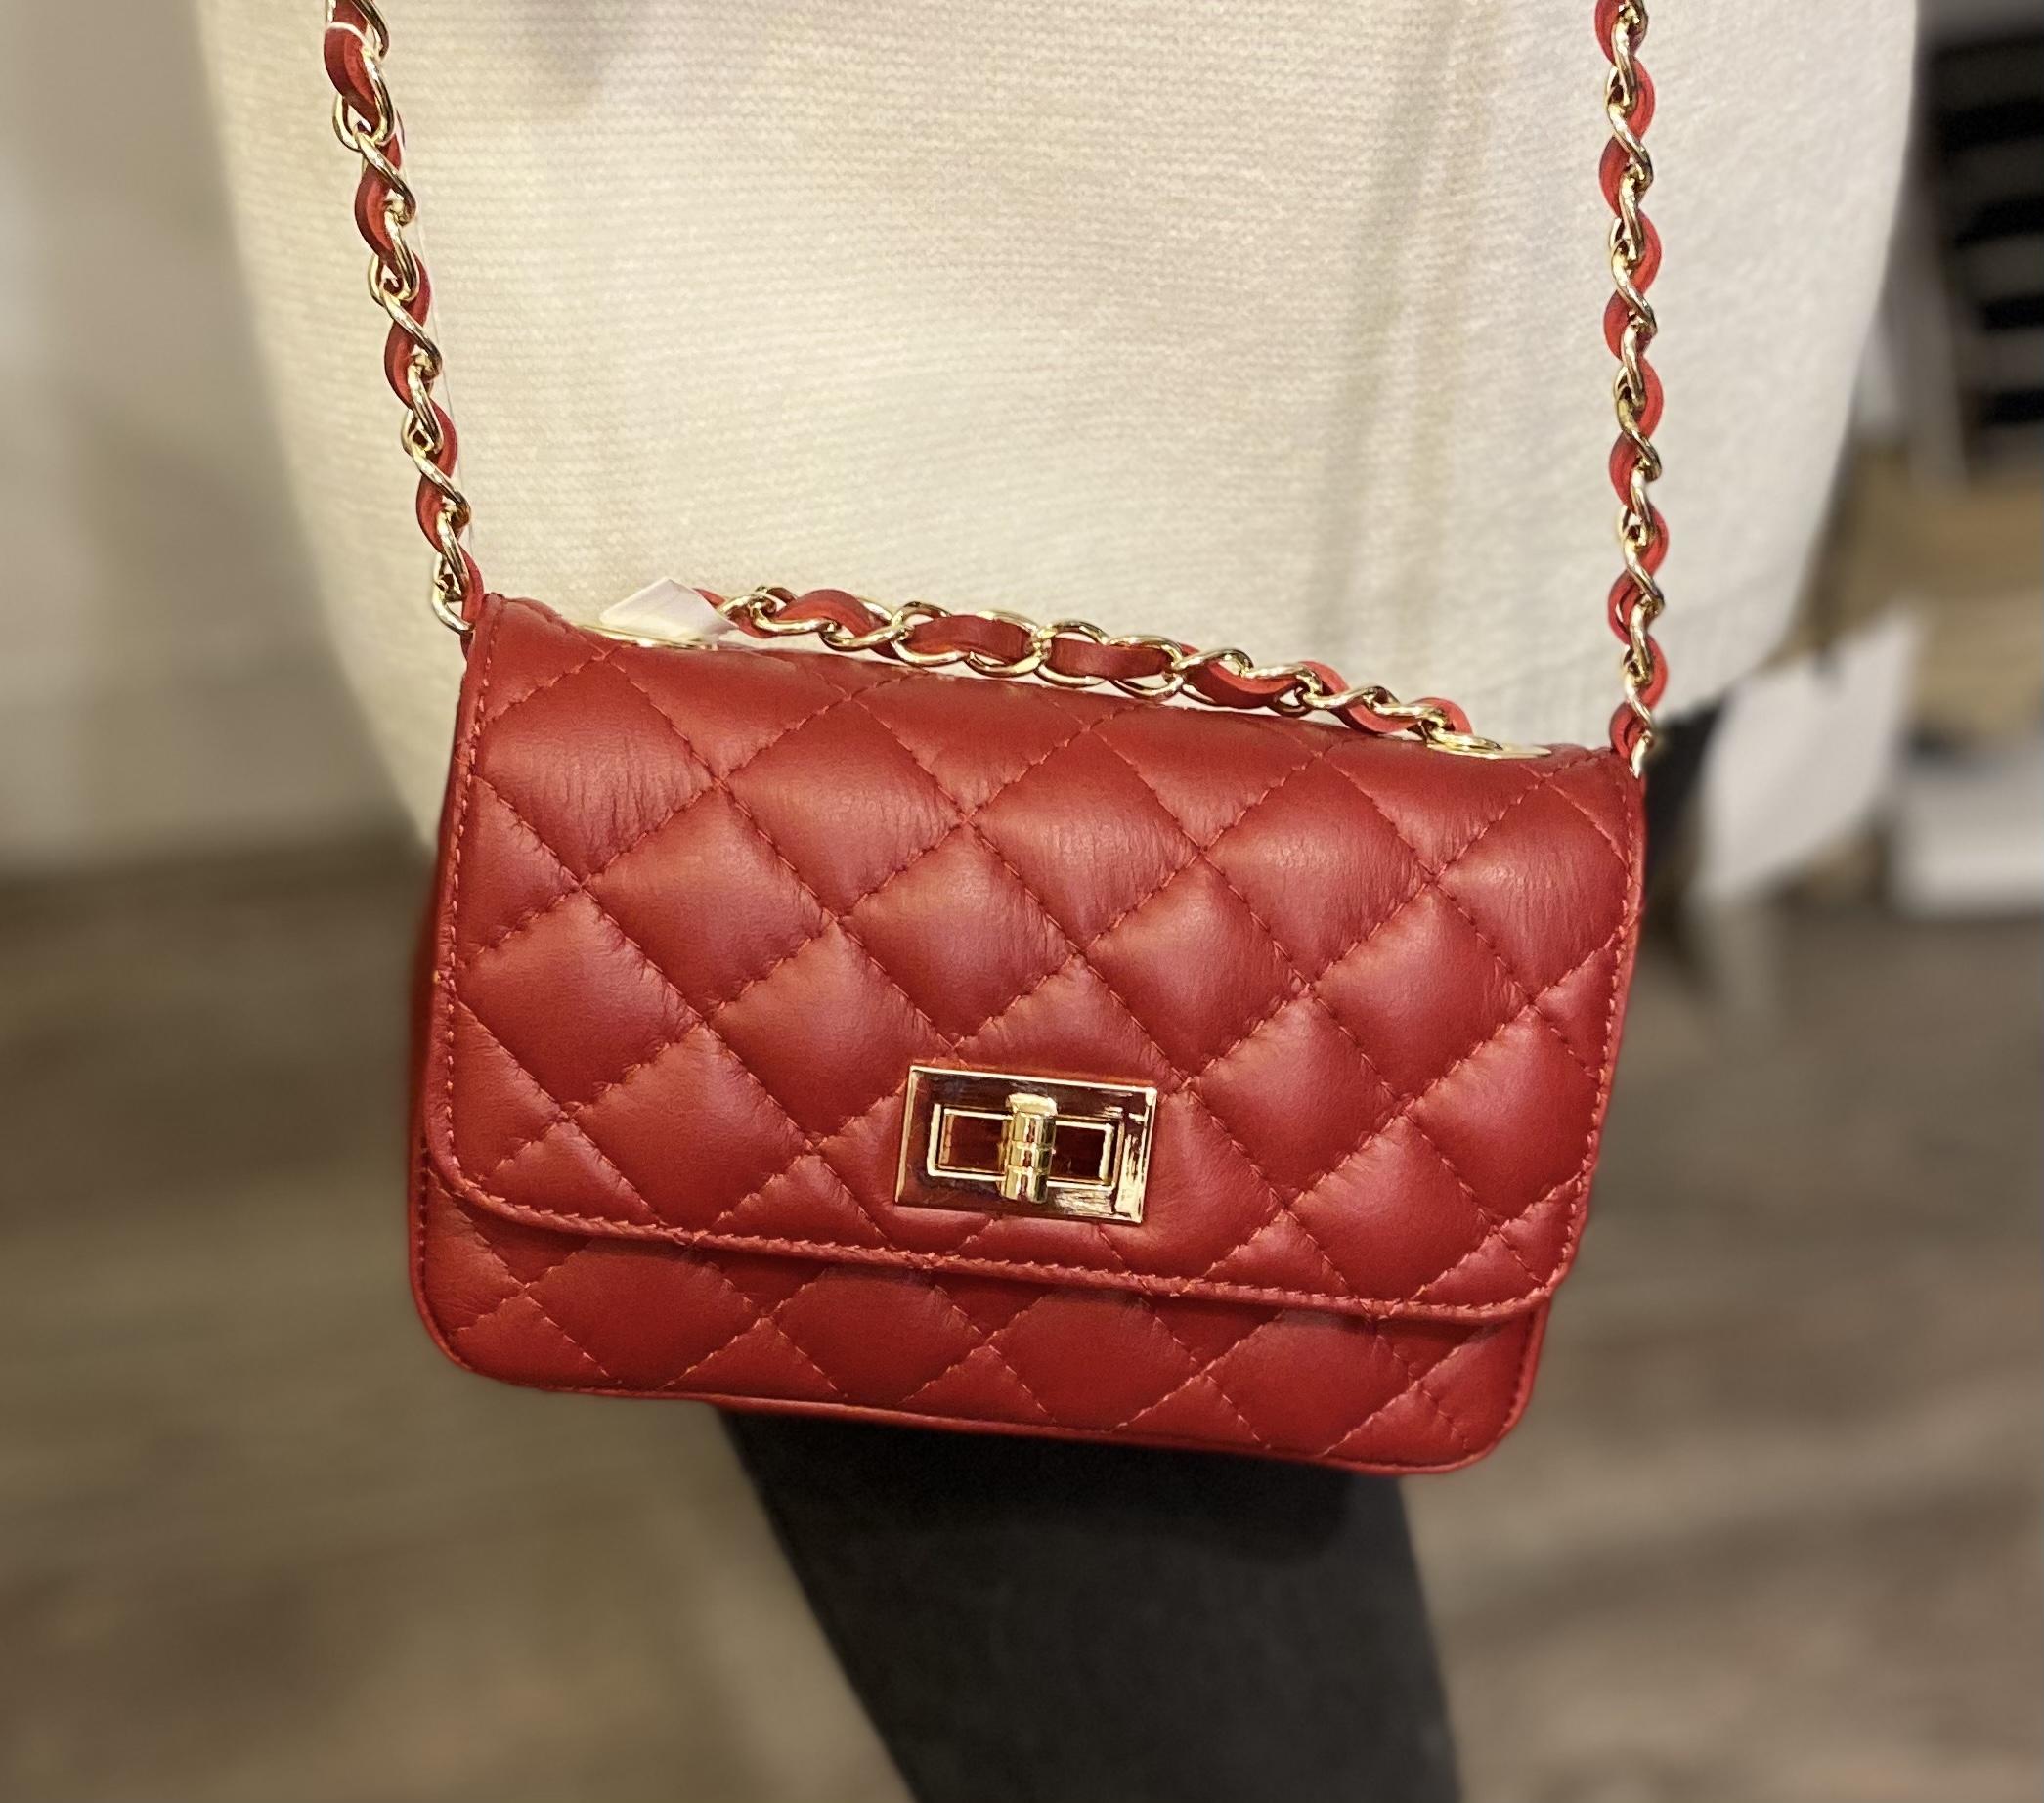 Red Chanel Style Handbag